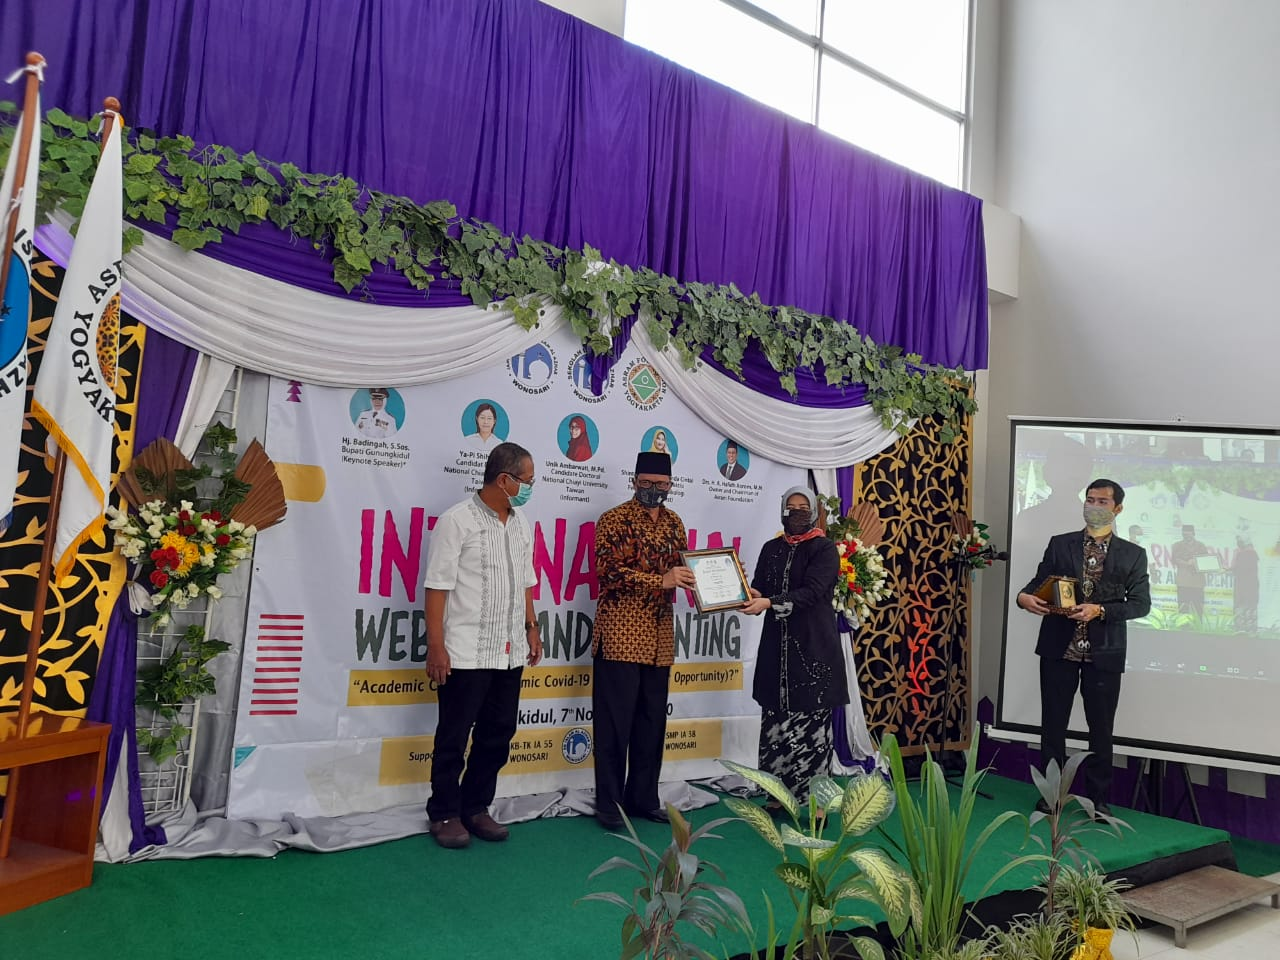 Sekolah Islam Al Azhar Wonosari Gelar International Webinar Parenting 157